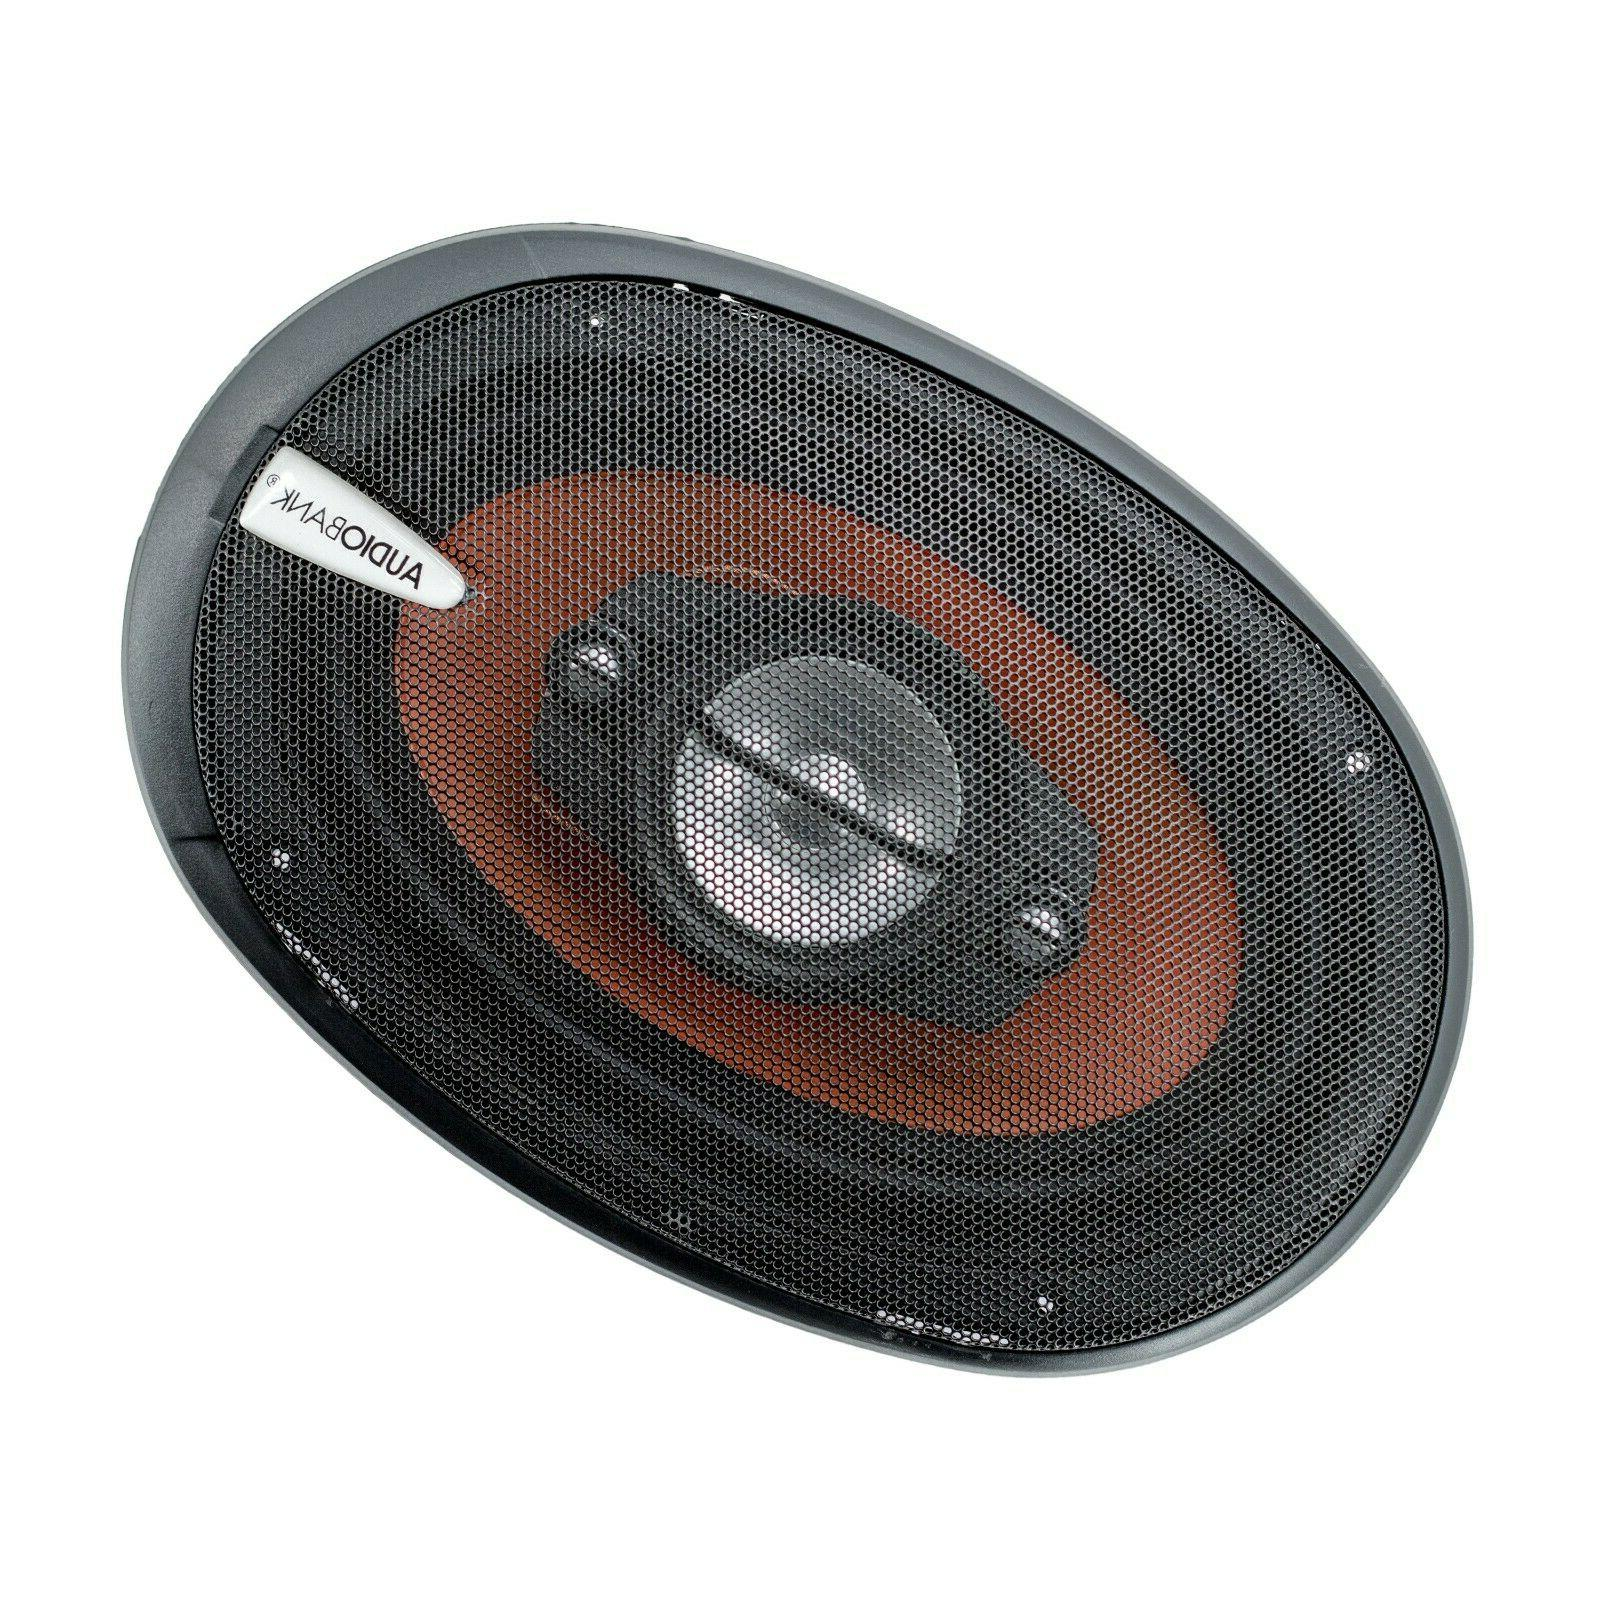 "2x 6"" x 700 Coaxial Car Audio CEA"